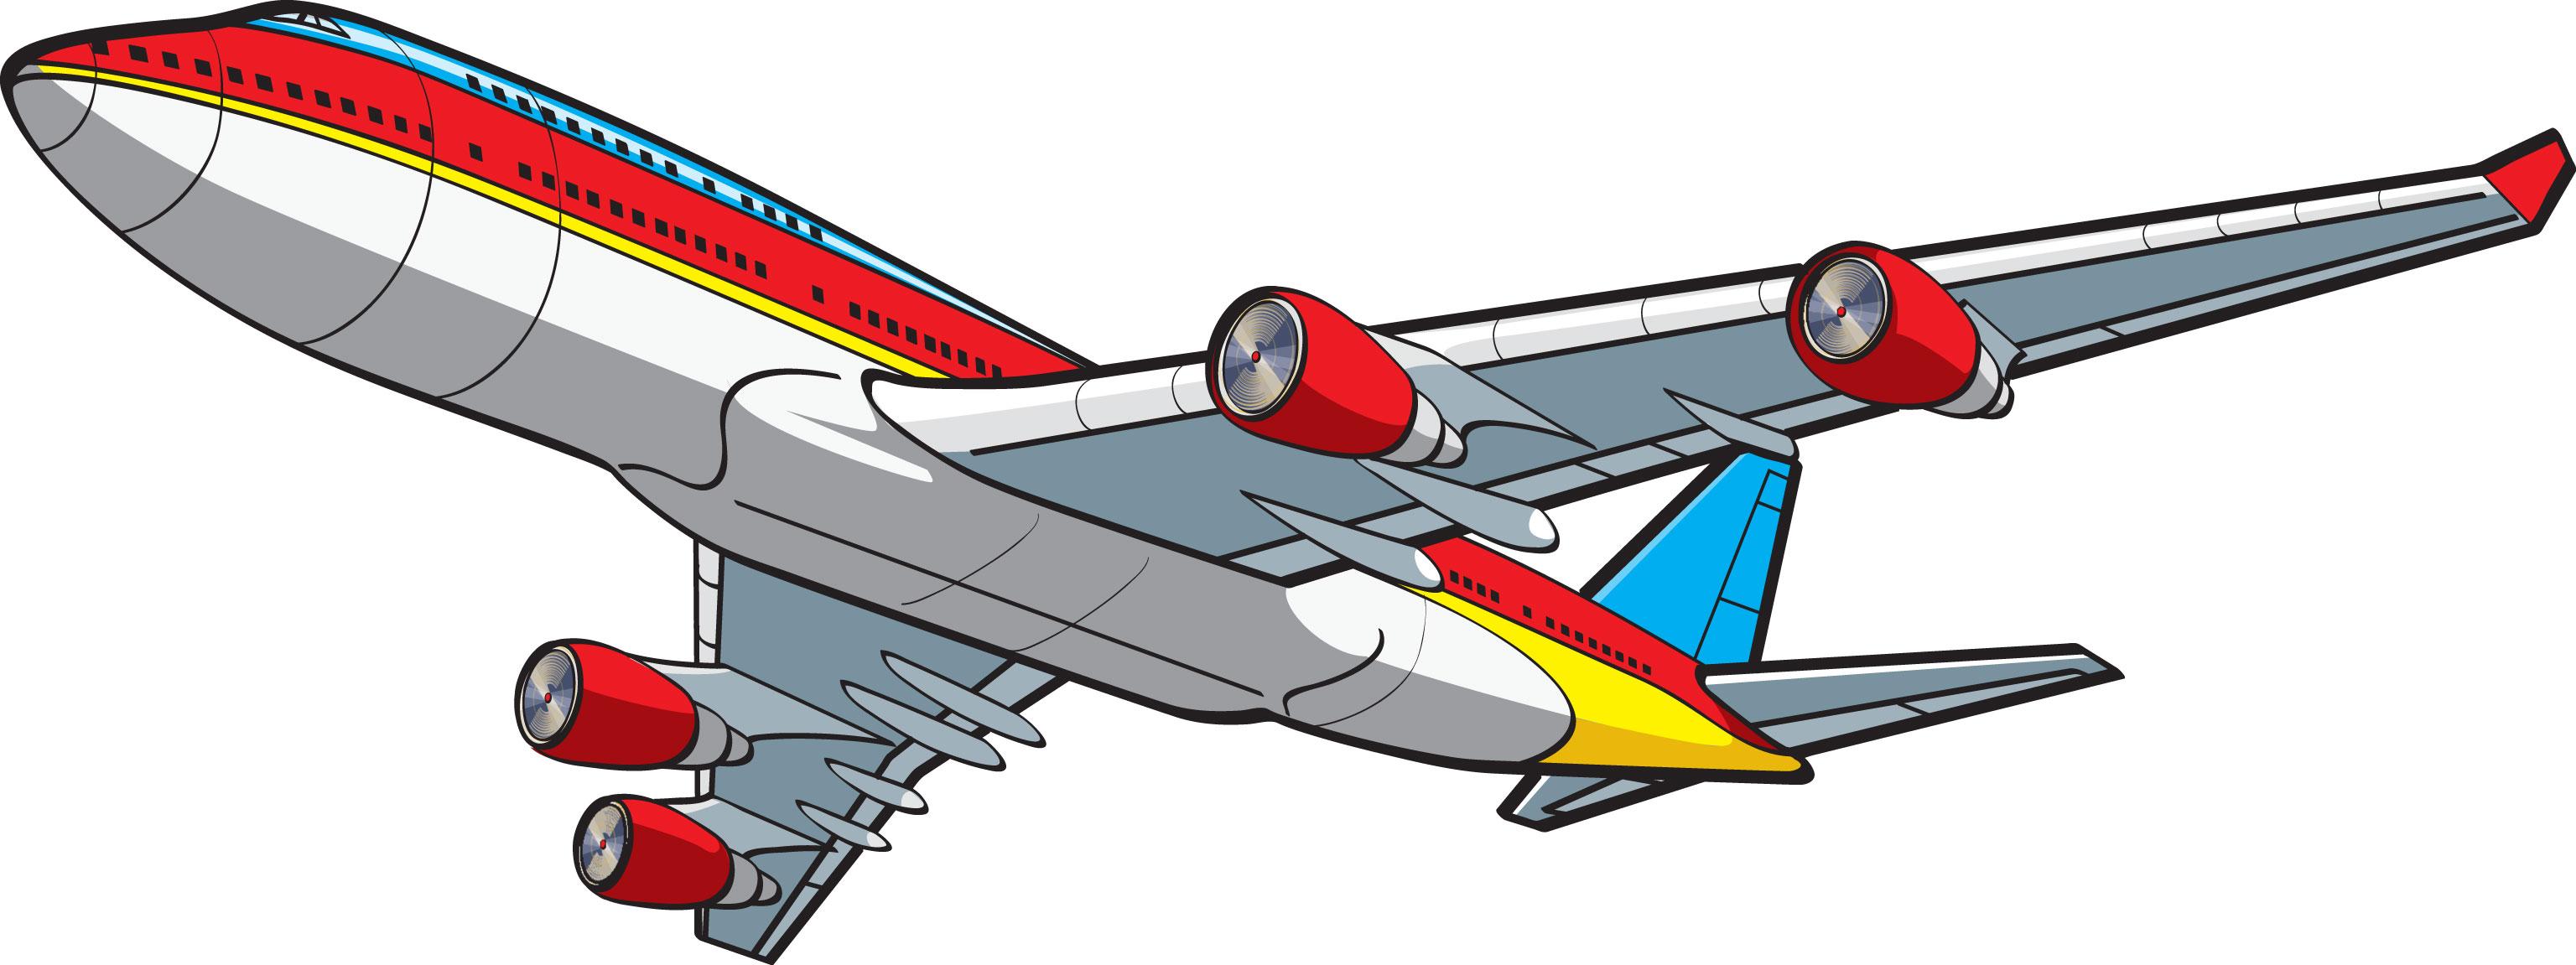 Aircraft Clip Art Photos   Clipart Panda - Free Clipart Images